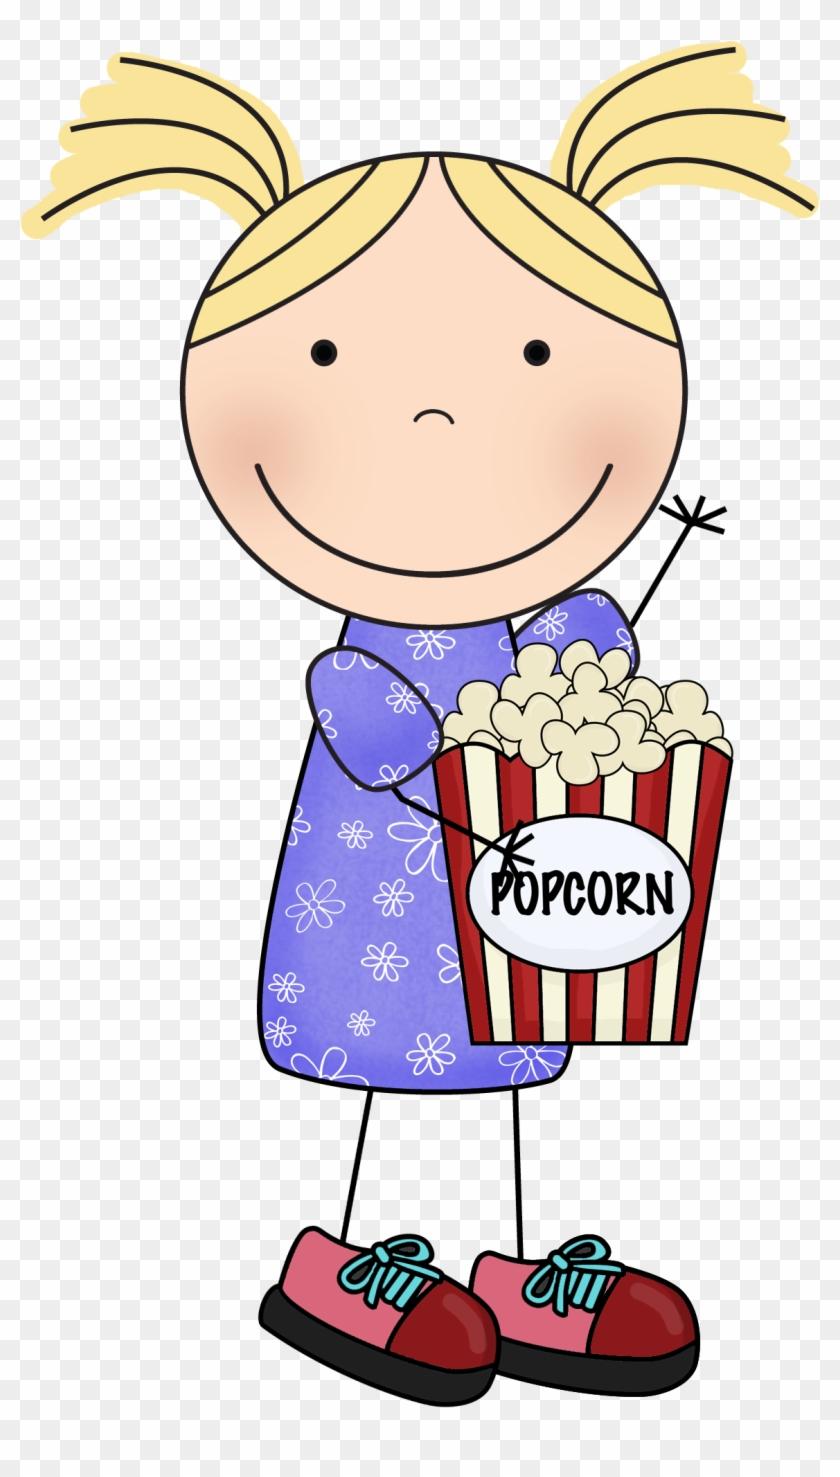 Popcorn Susie1 - Scrappin Doodles Popcorn #22320